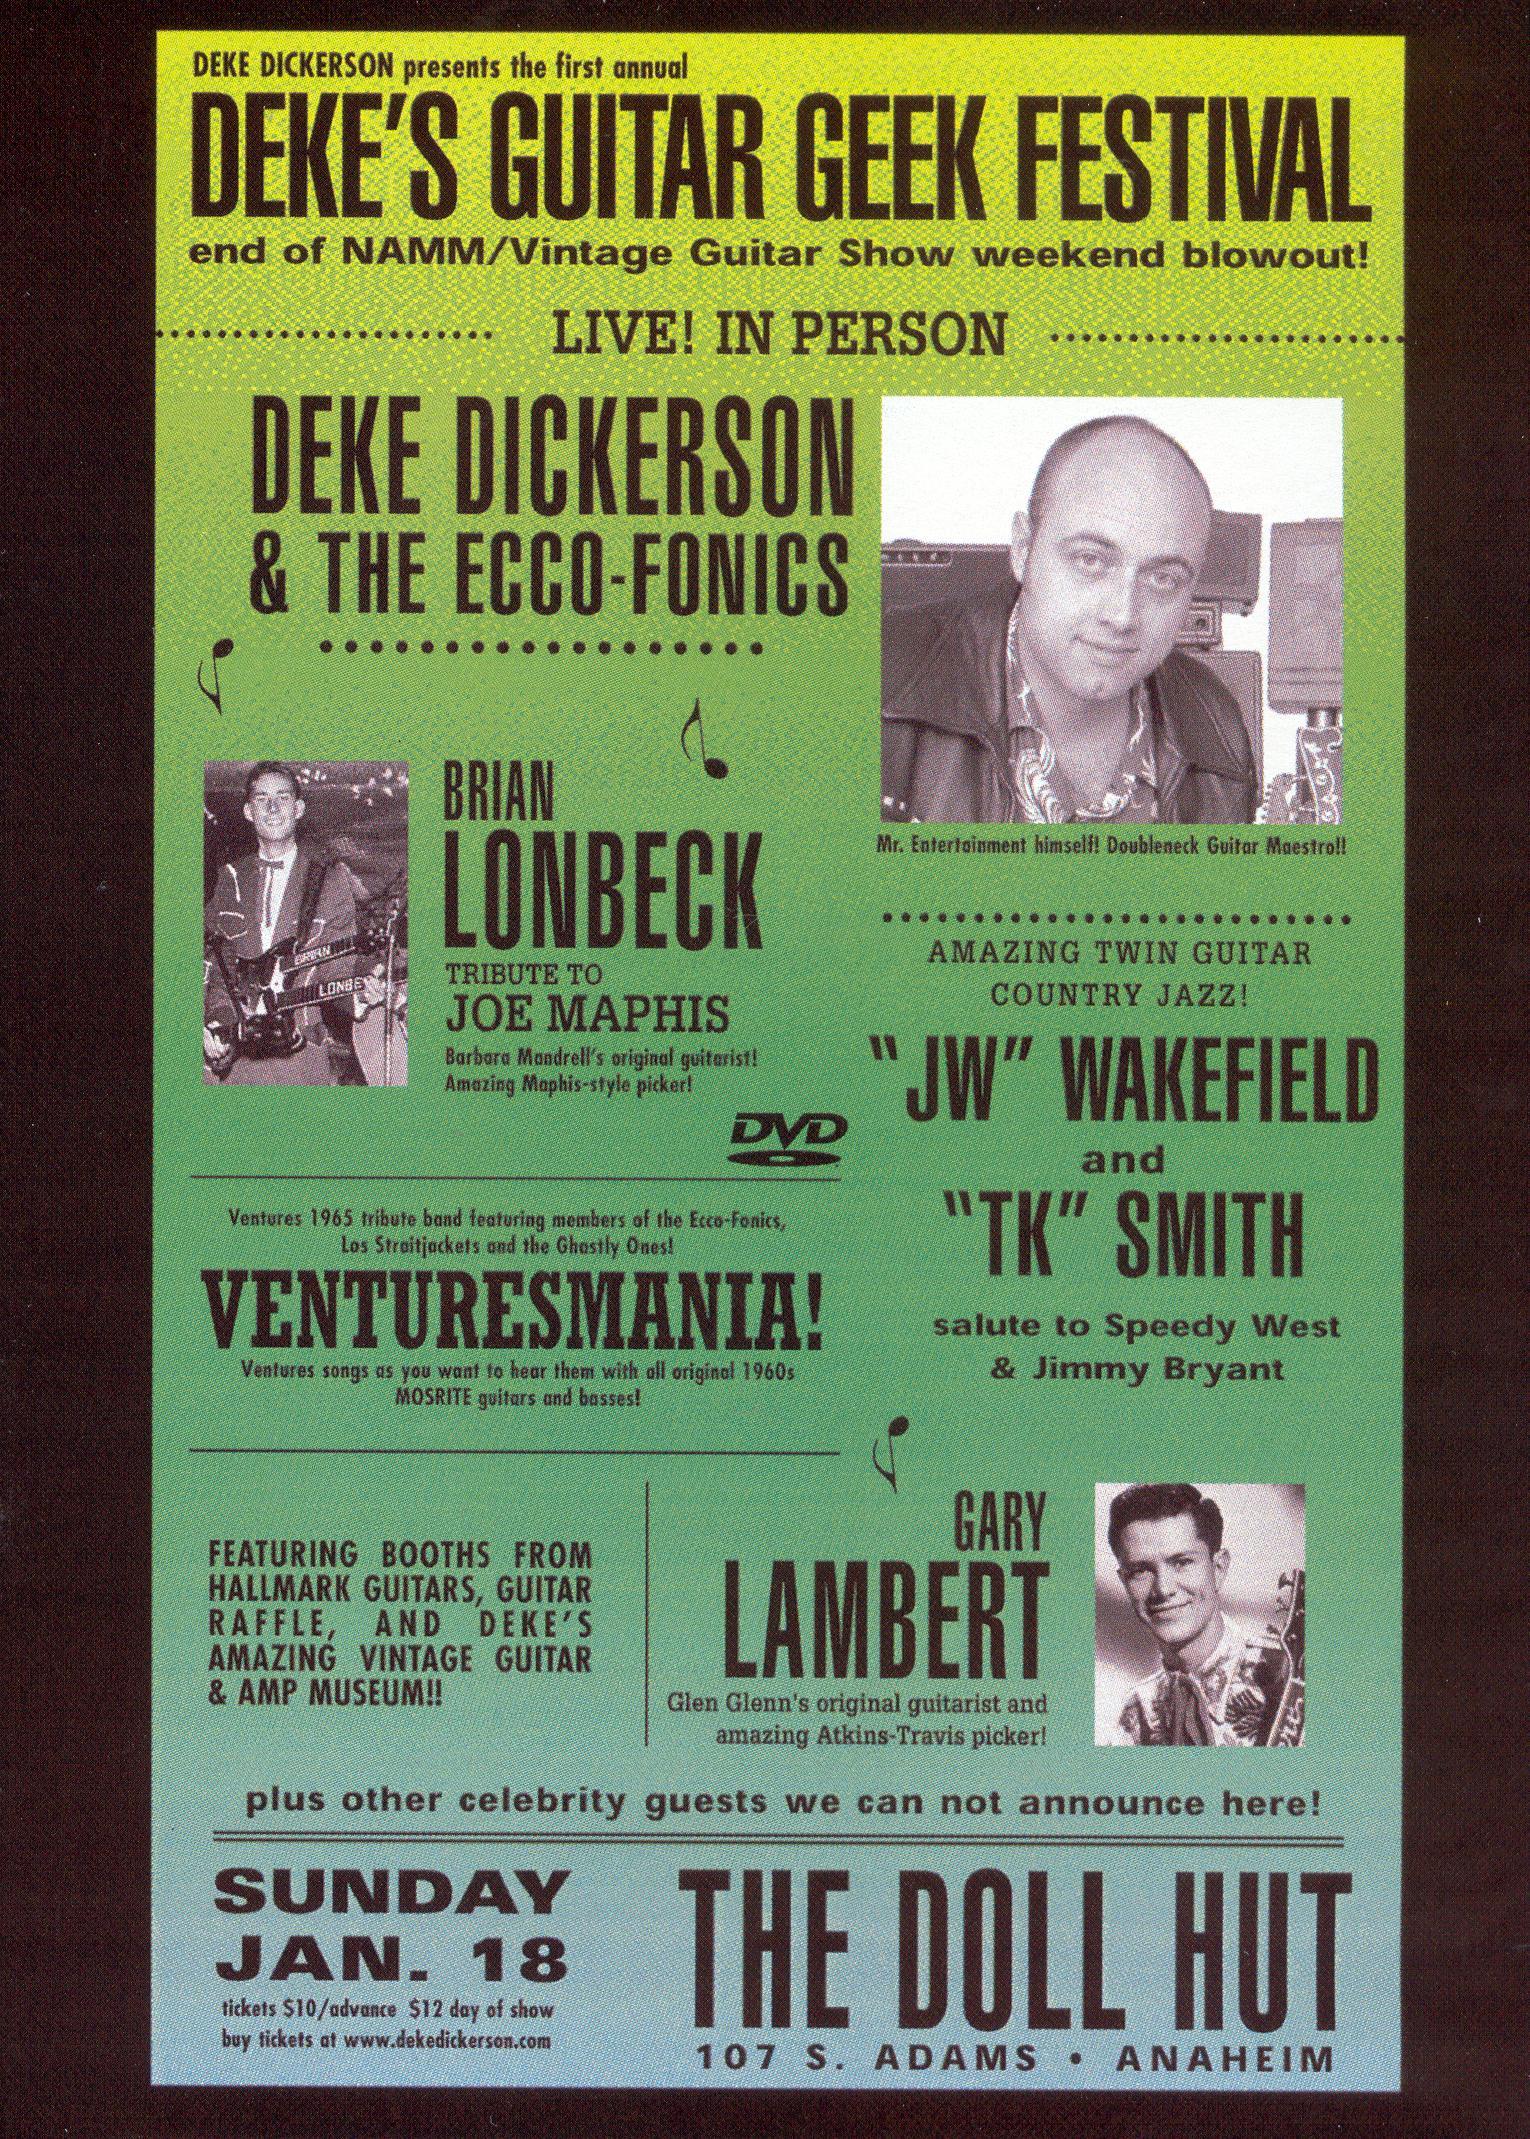 Deke Dickerson: The Melody